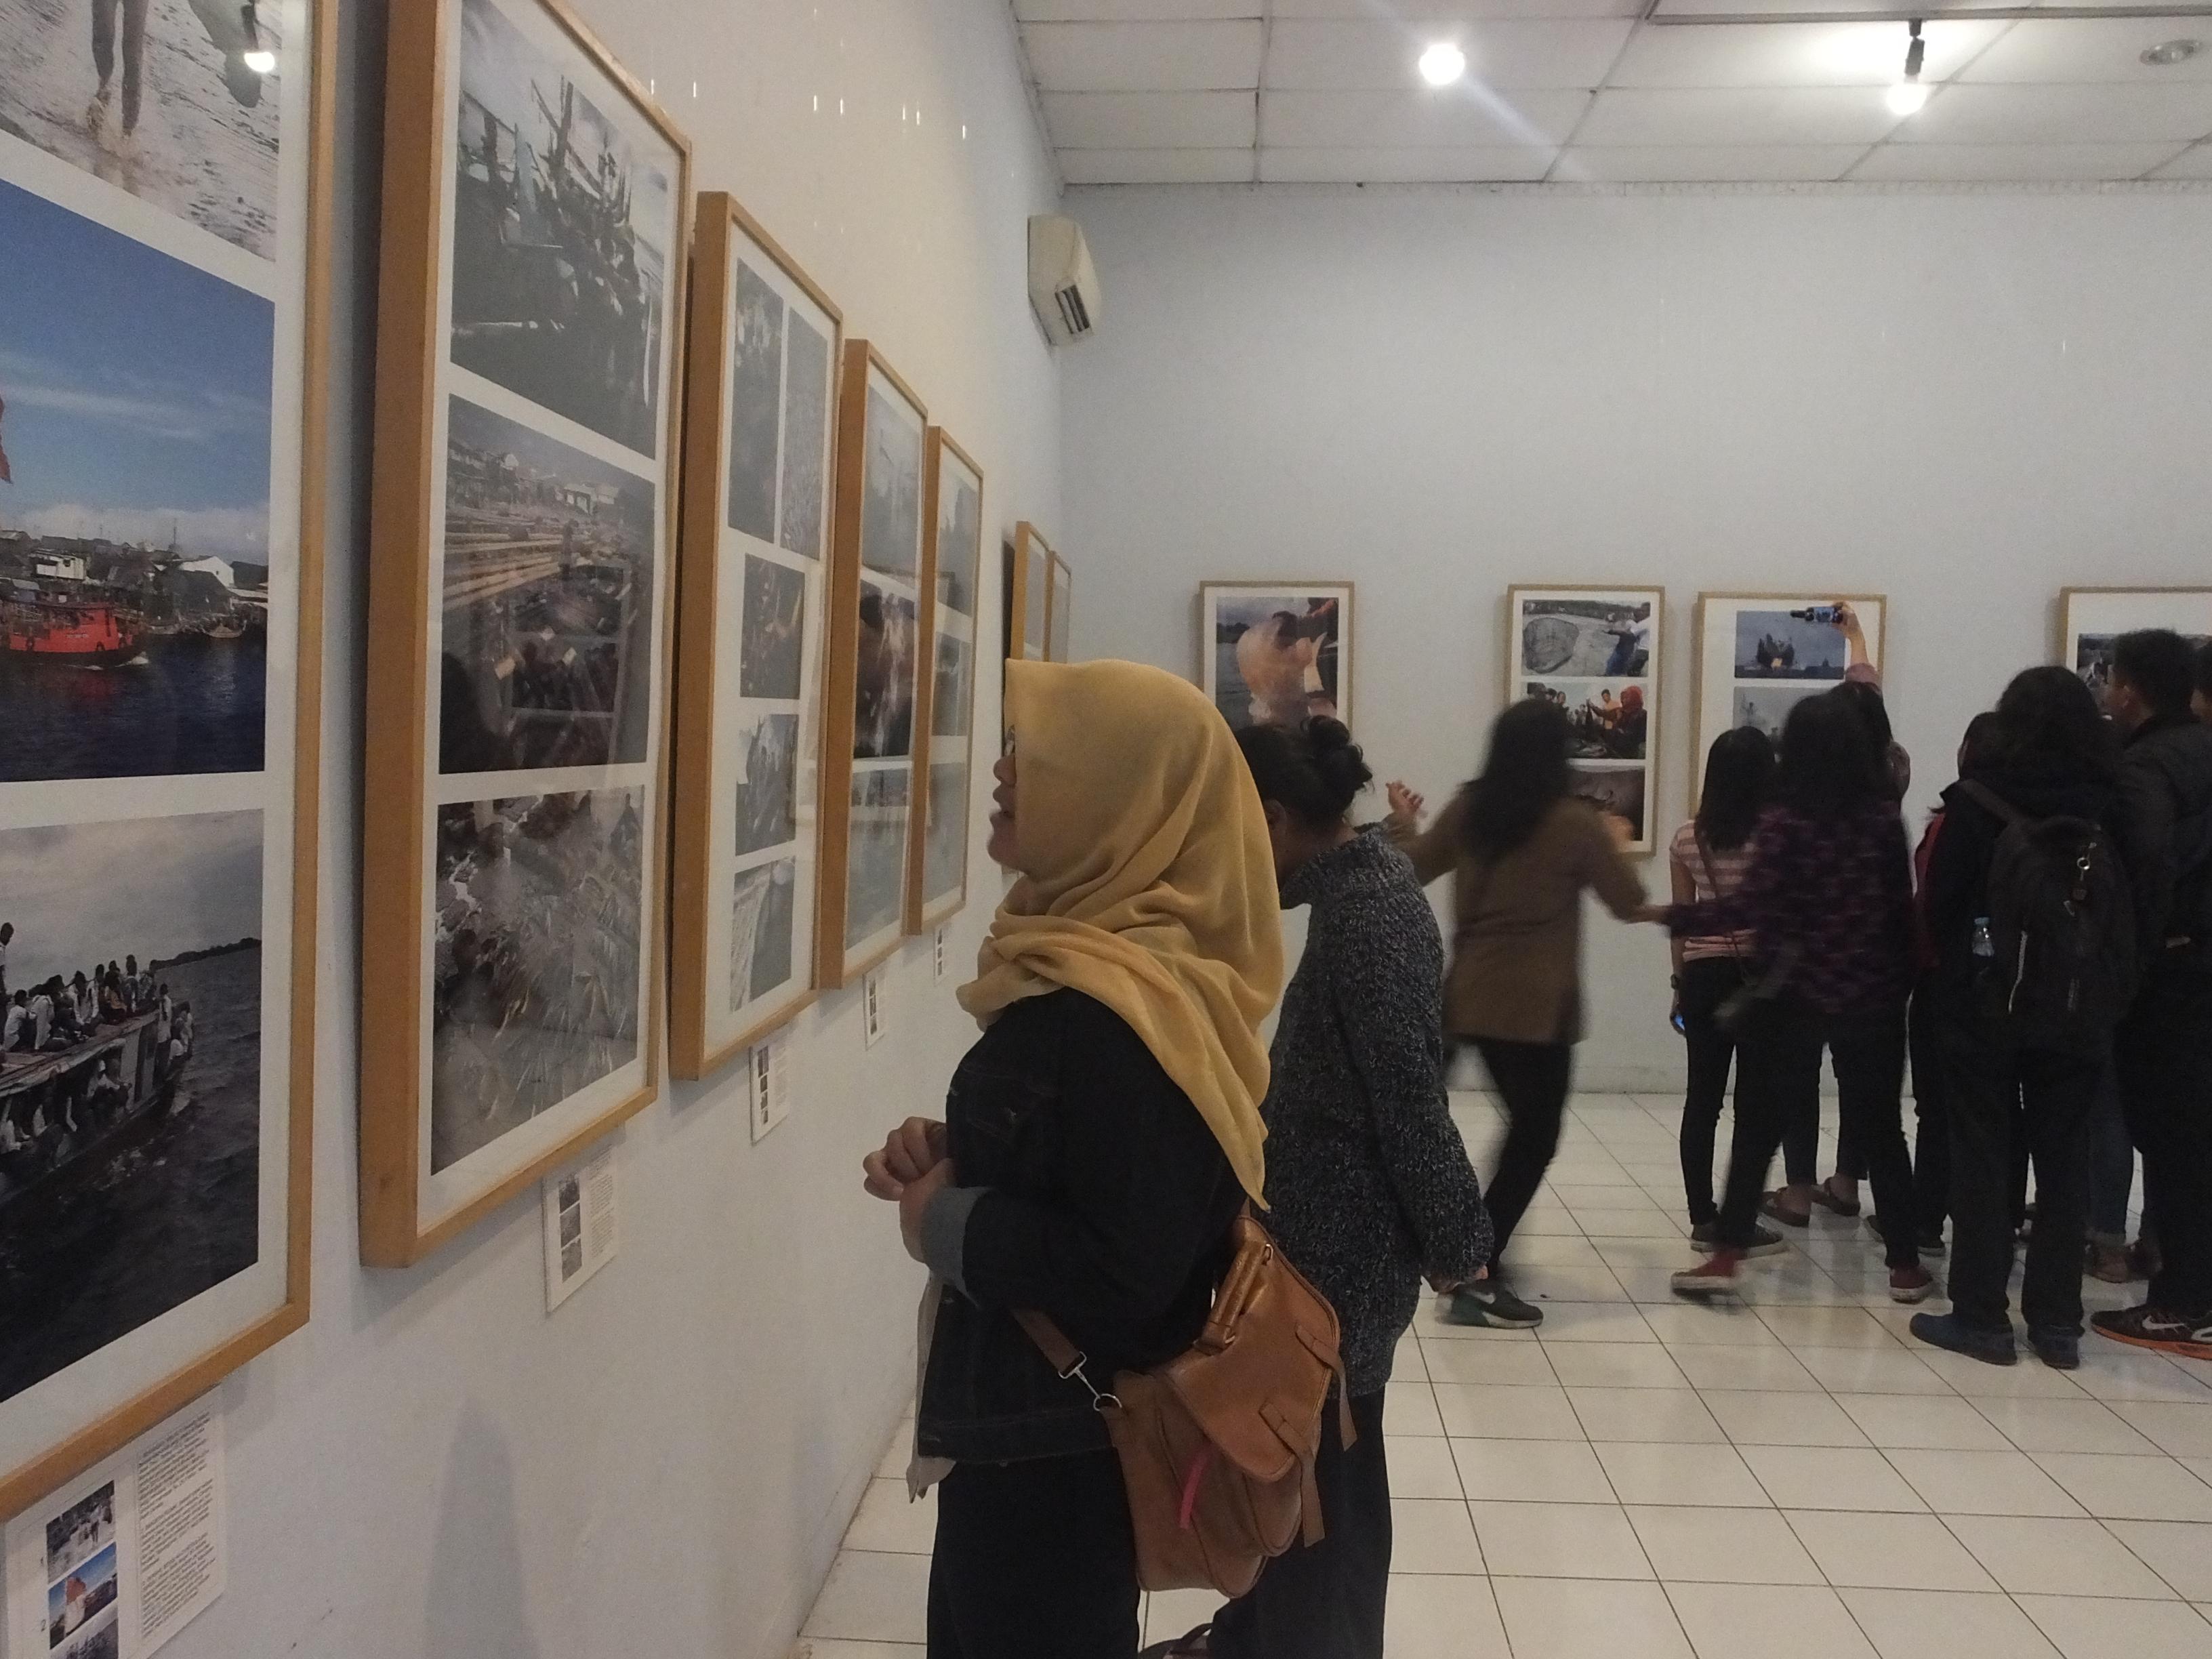 "Beberapa pengunjung mengamati koleksi foto pameran bertema ""Bahari"" oleh Pewarta Foto Indonesia (PFI) Yogyakarta di Bentara Budaya Yogyakarta (09/09).Foto:Isnan/PENDAPA"